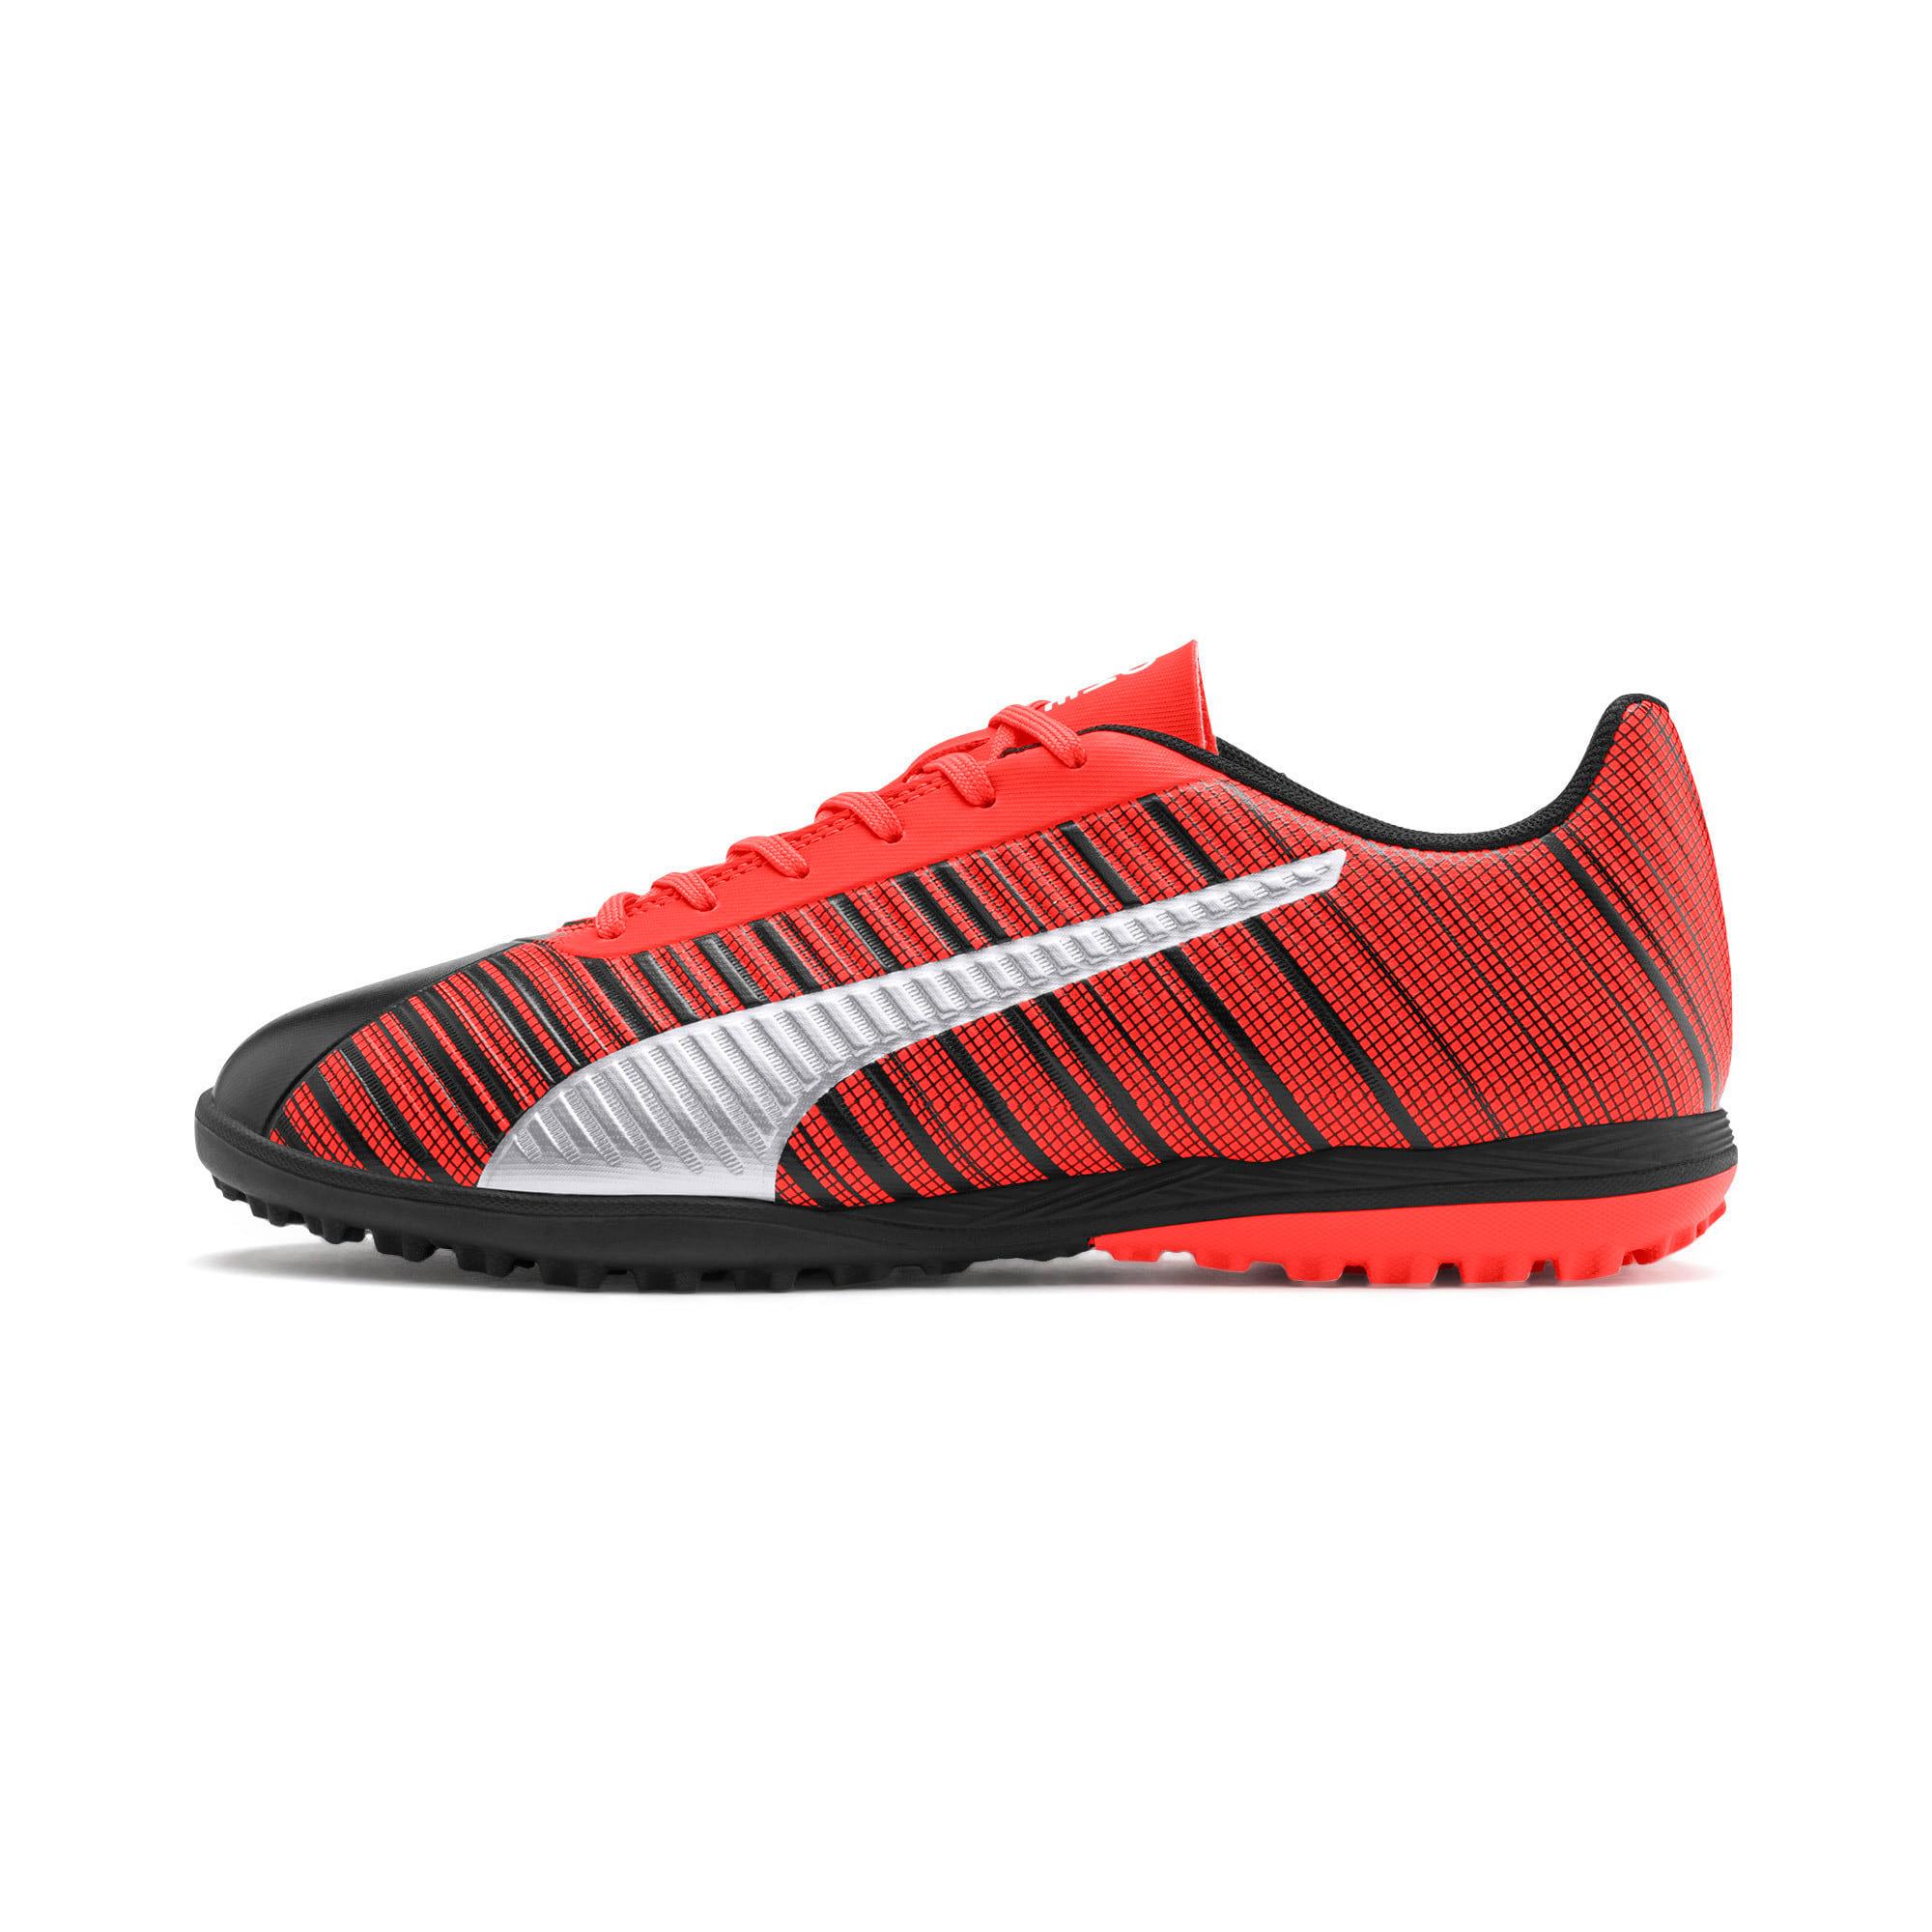 Thumbnail 1 of PUMA ONE 5.4 TT Men's Soccer Shoes, Black-Nrgy Red-Aged Silver, medium